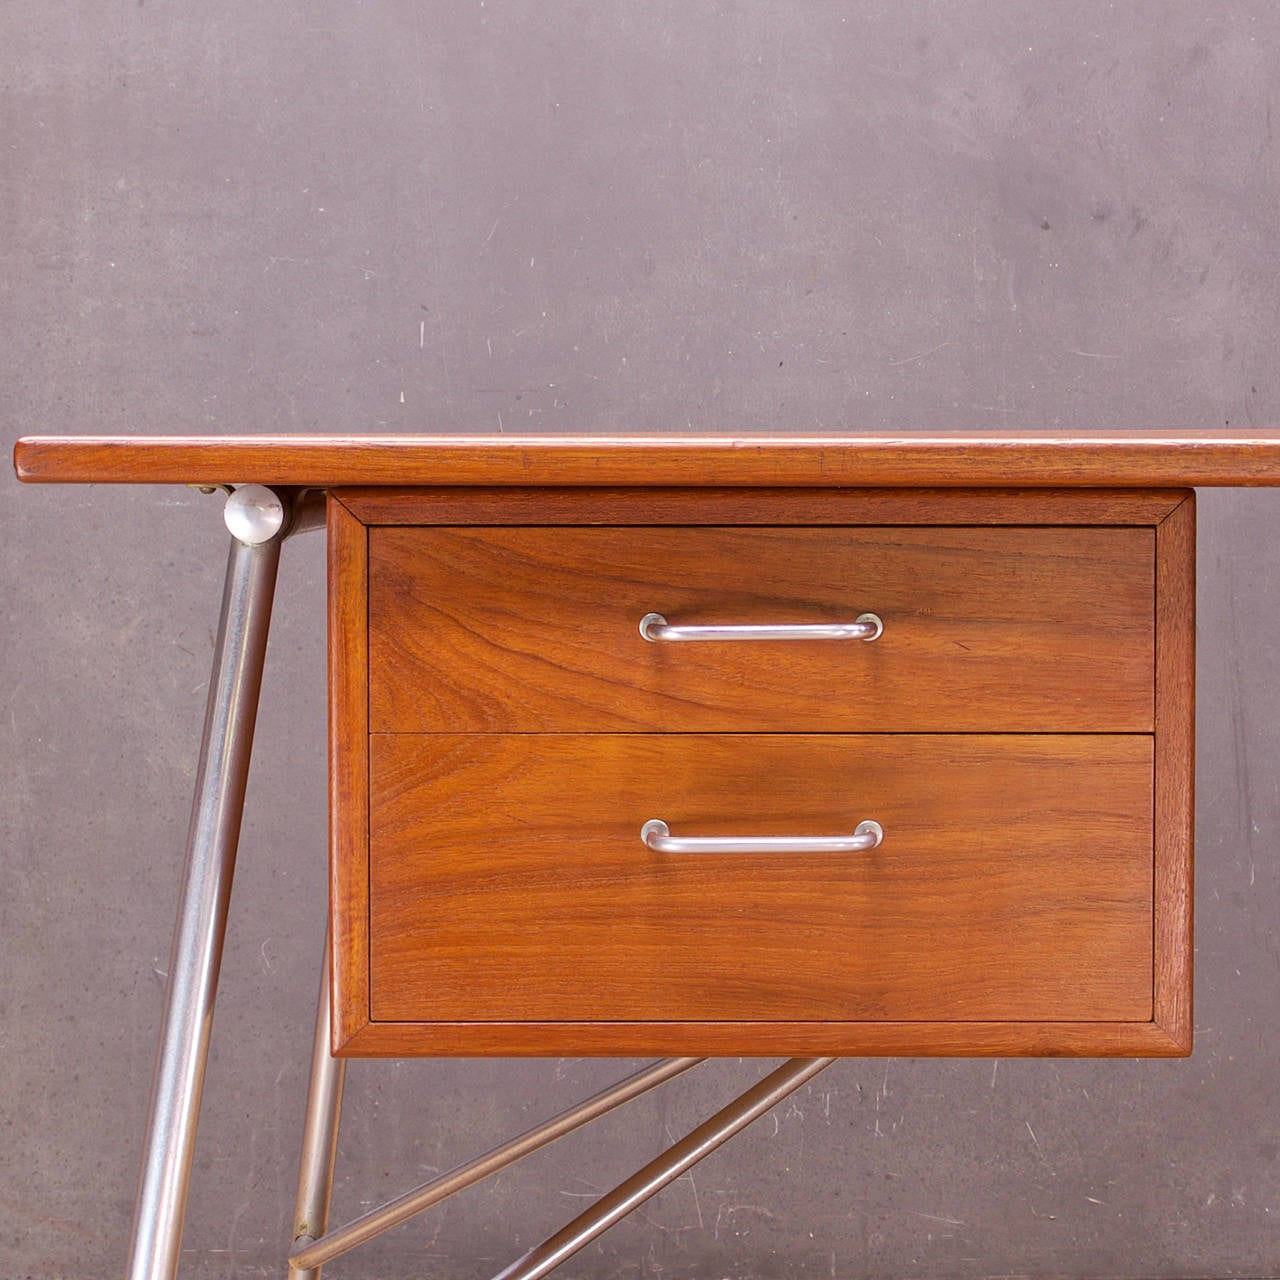 Rare Borge Mogensen Teak and Steel Desk Vintage Mid-Century Soborg Mobler In Fair Condition For Sale In Washington, DC